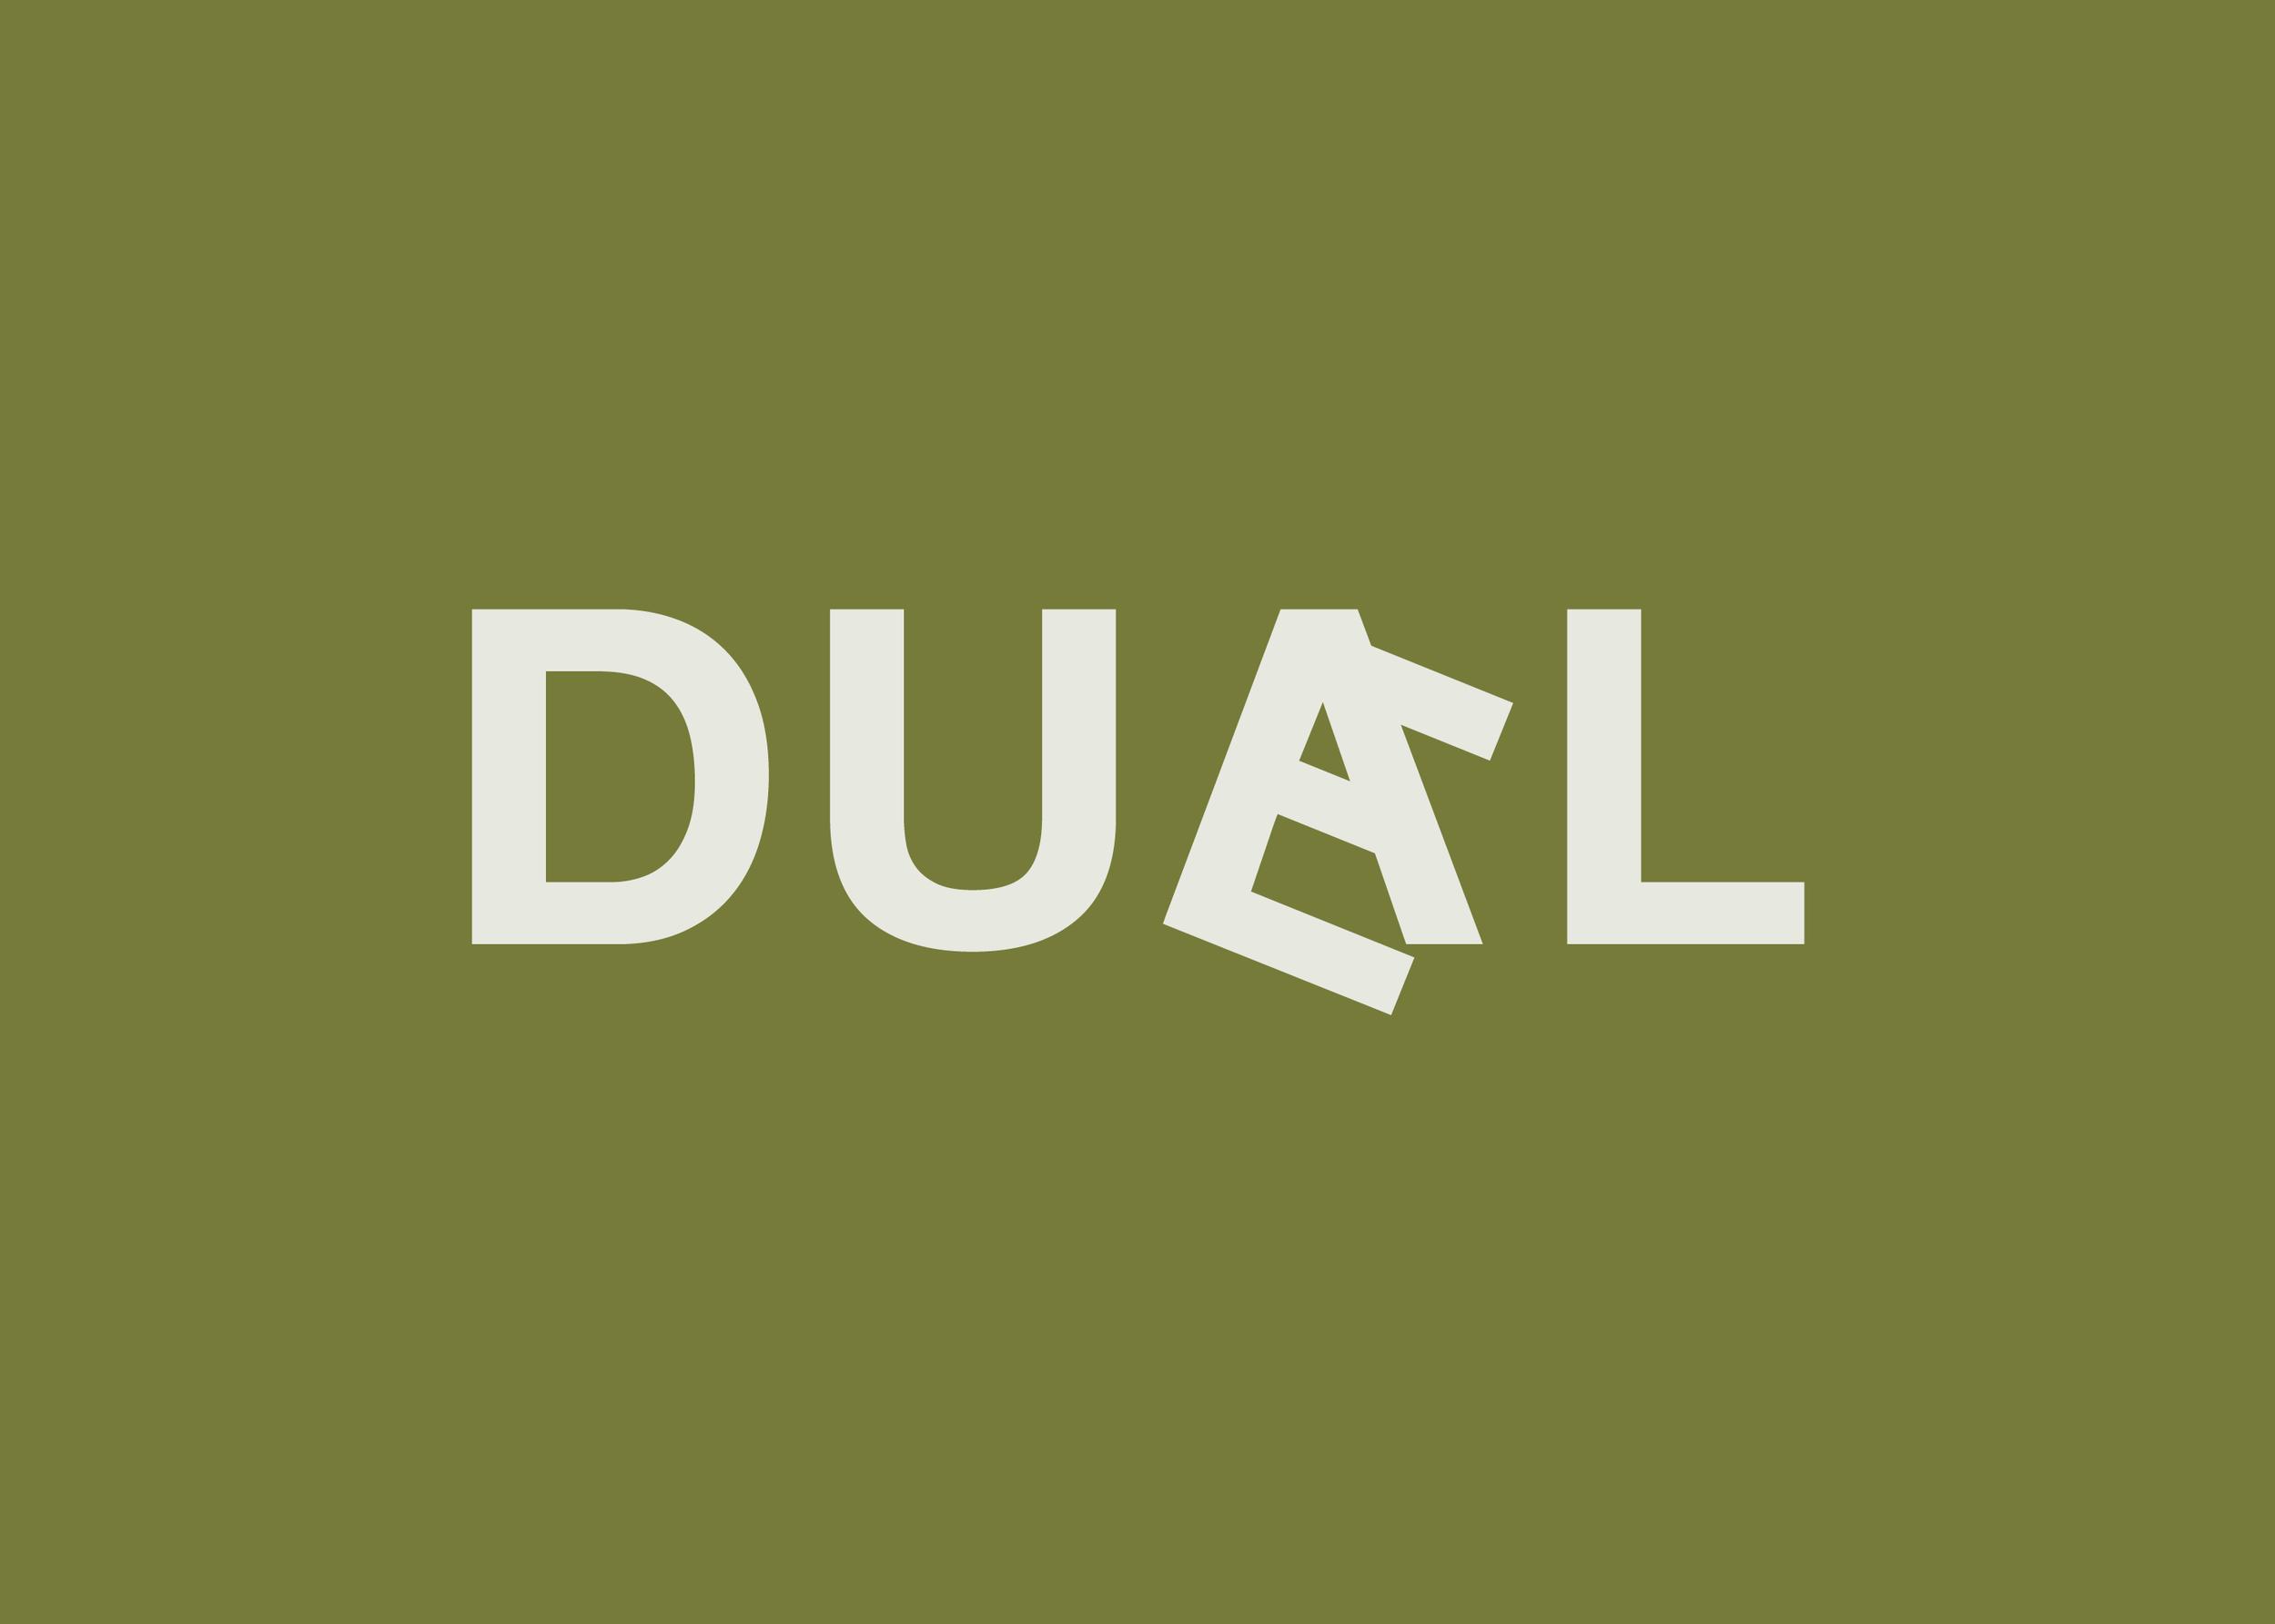 duael_flip12.png